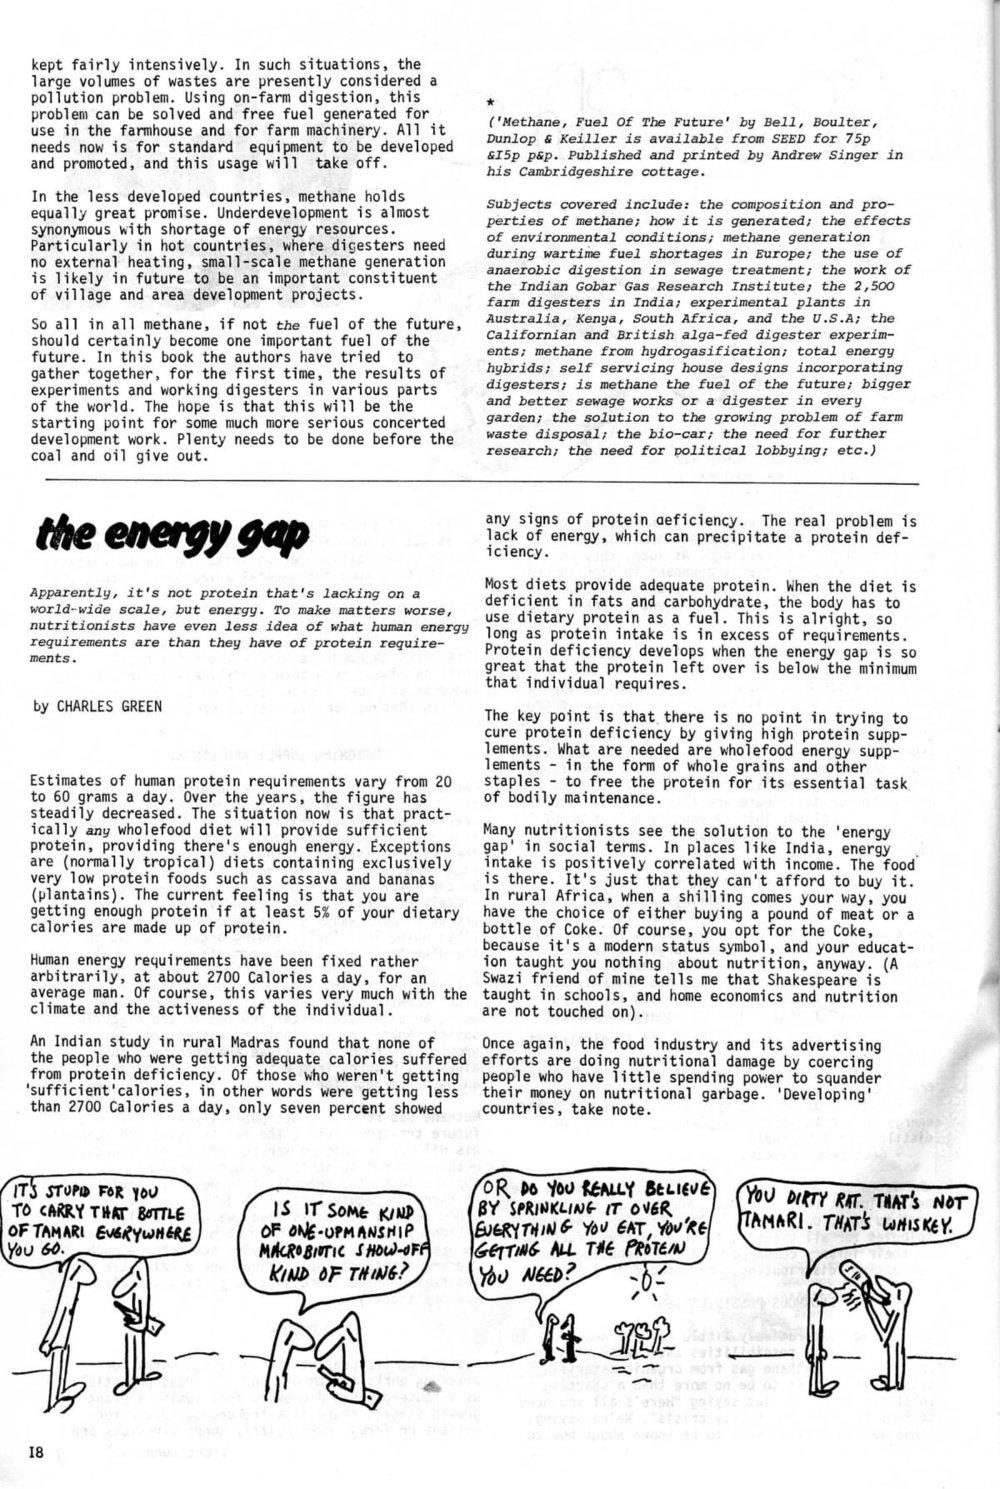 seed-v2-n10-oct1973-25.jpg